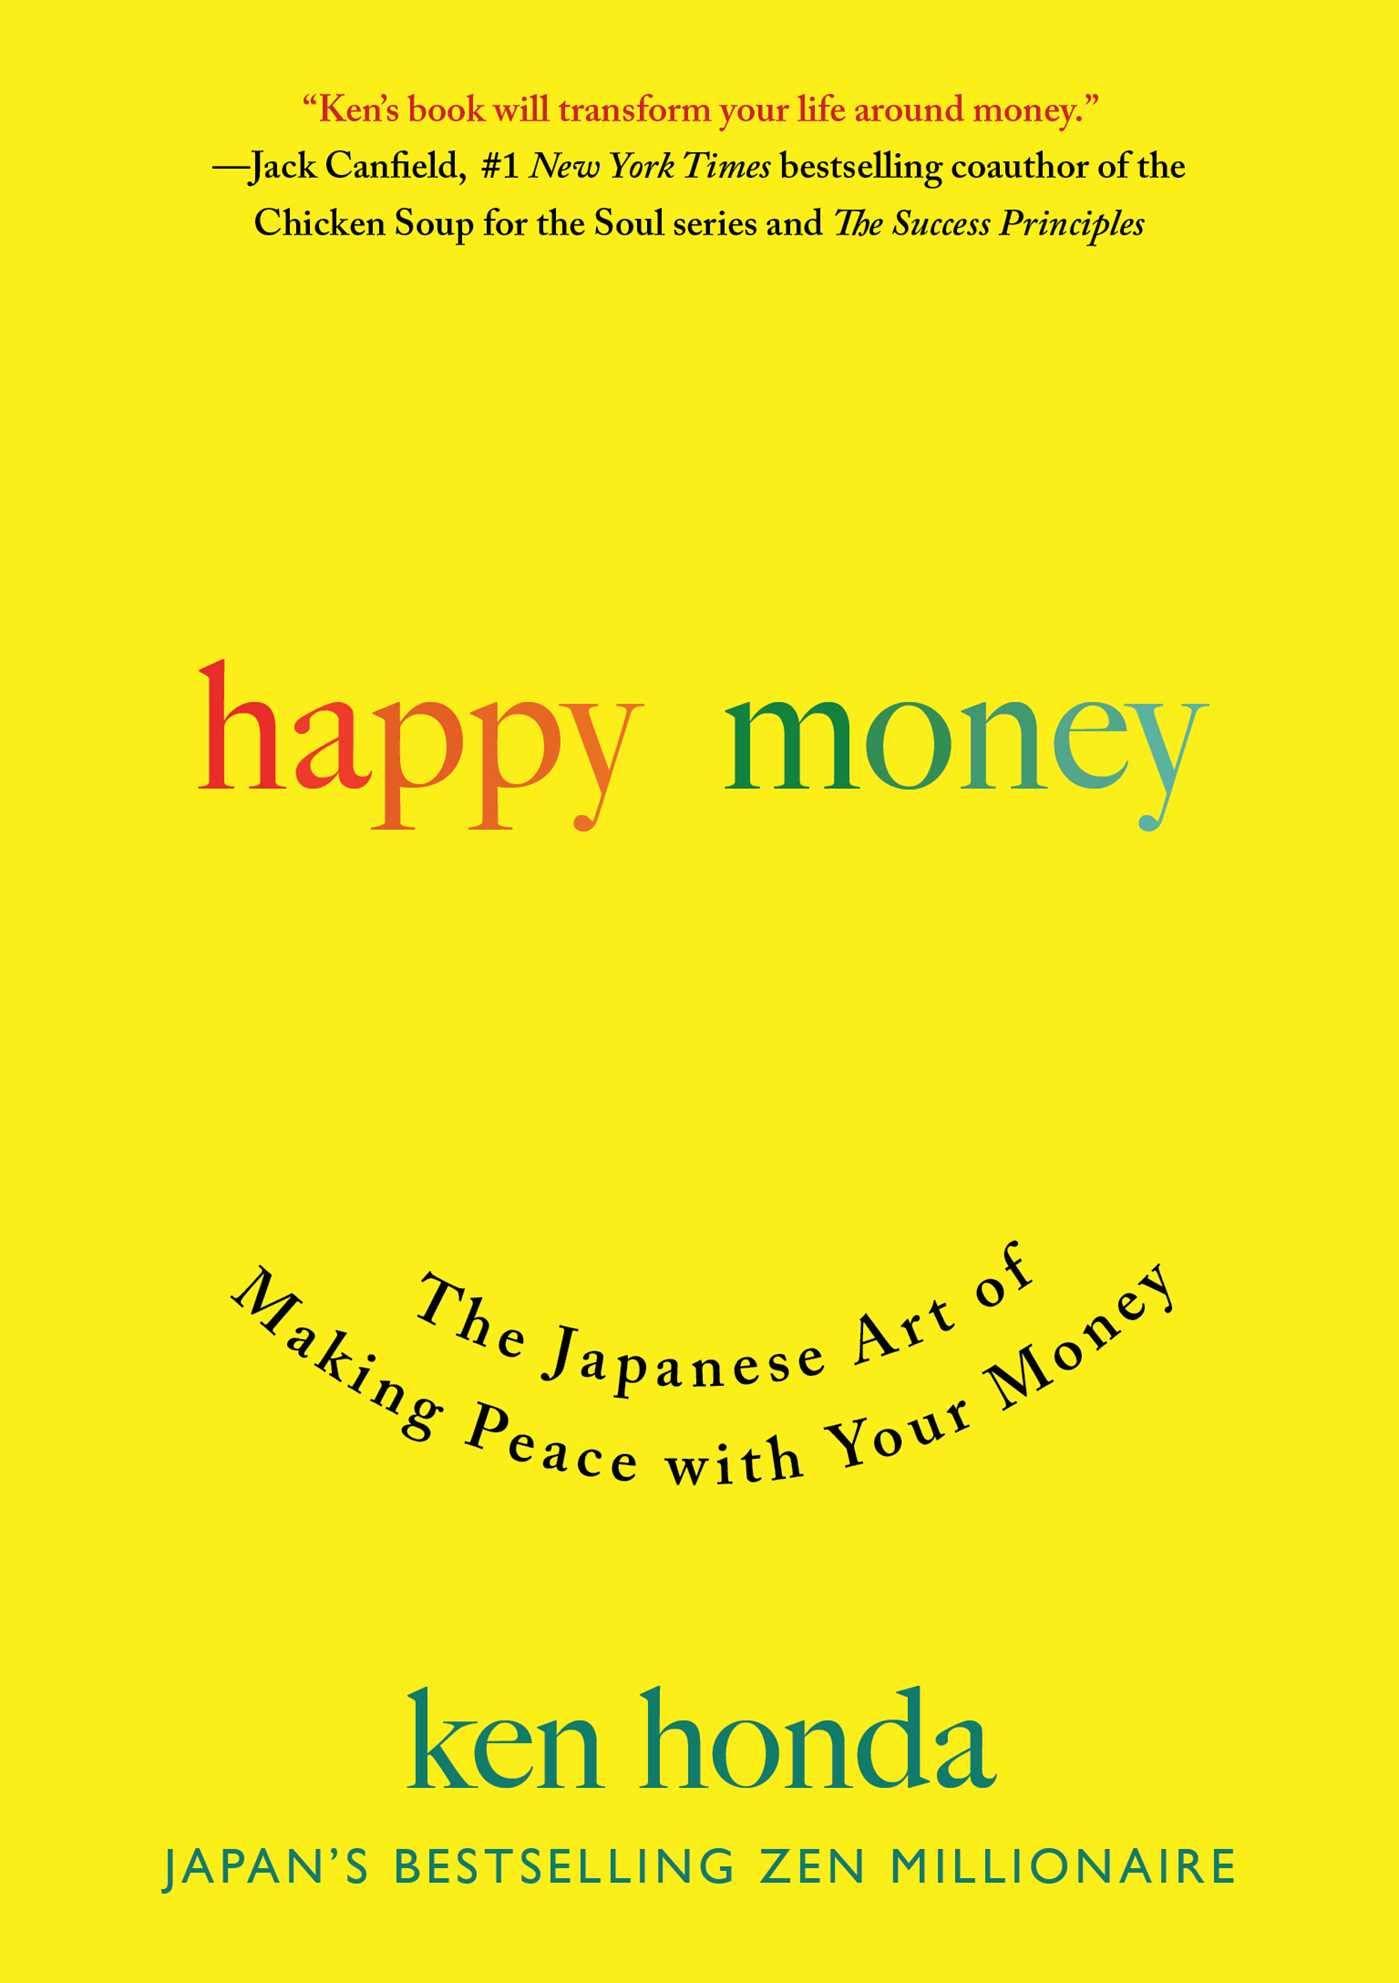 Ken Honda Happy Money cover